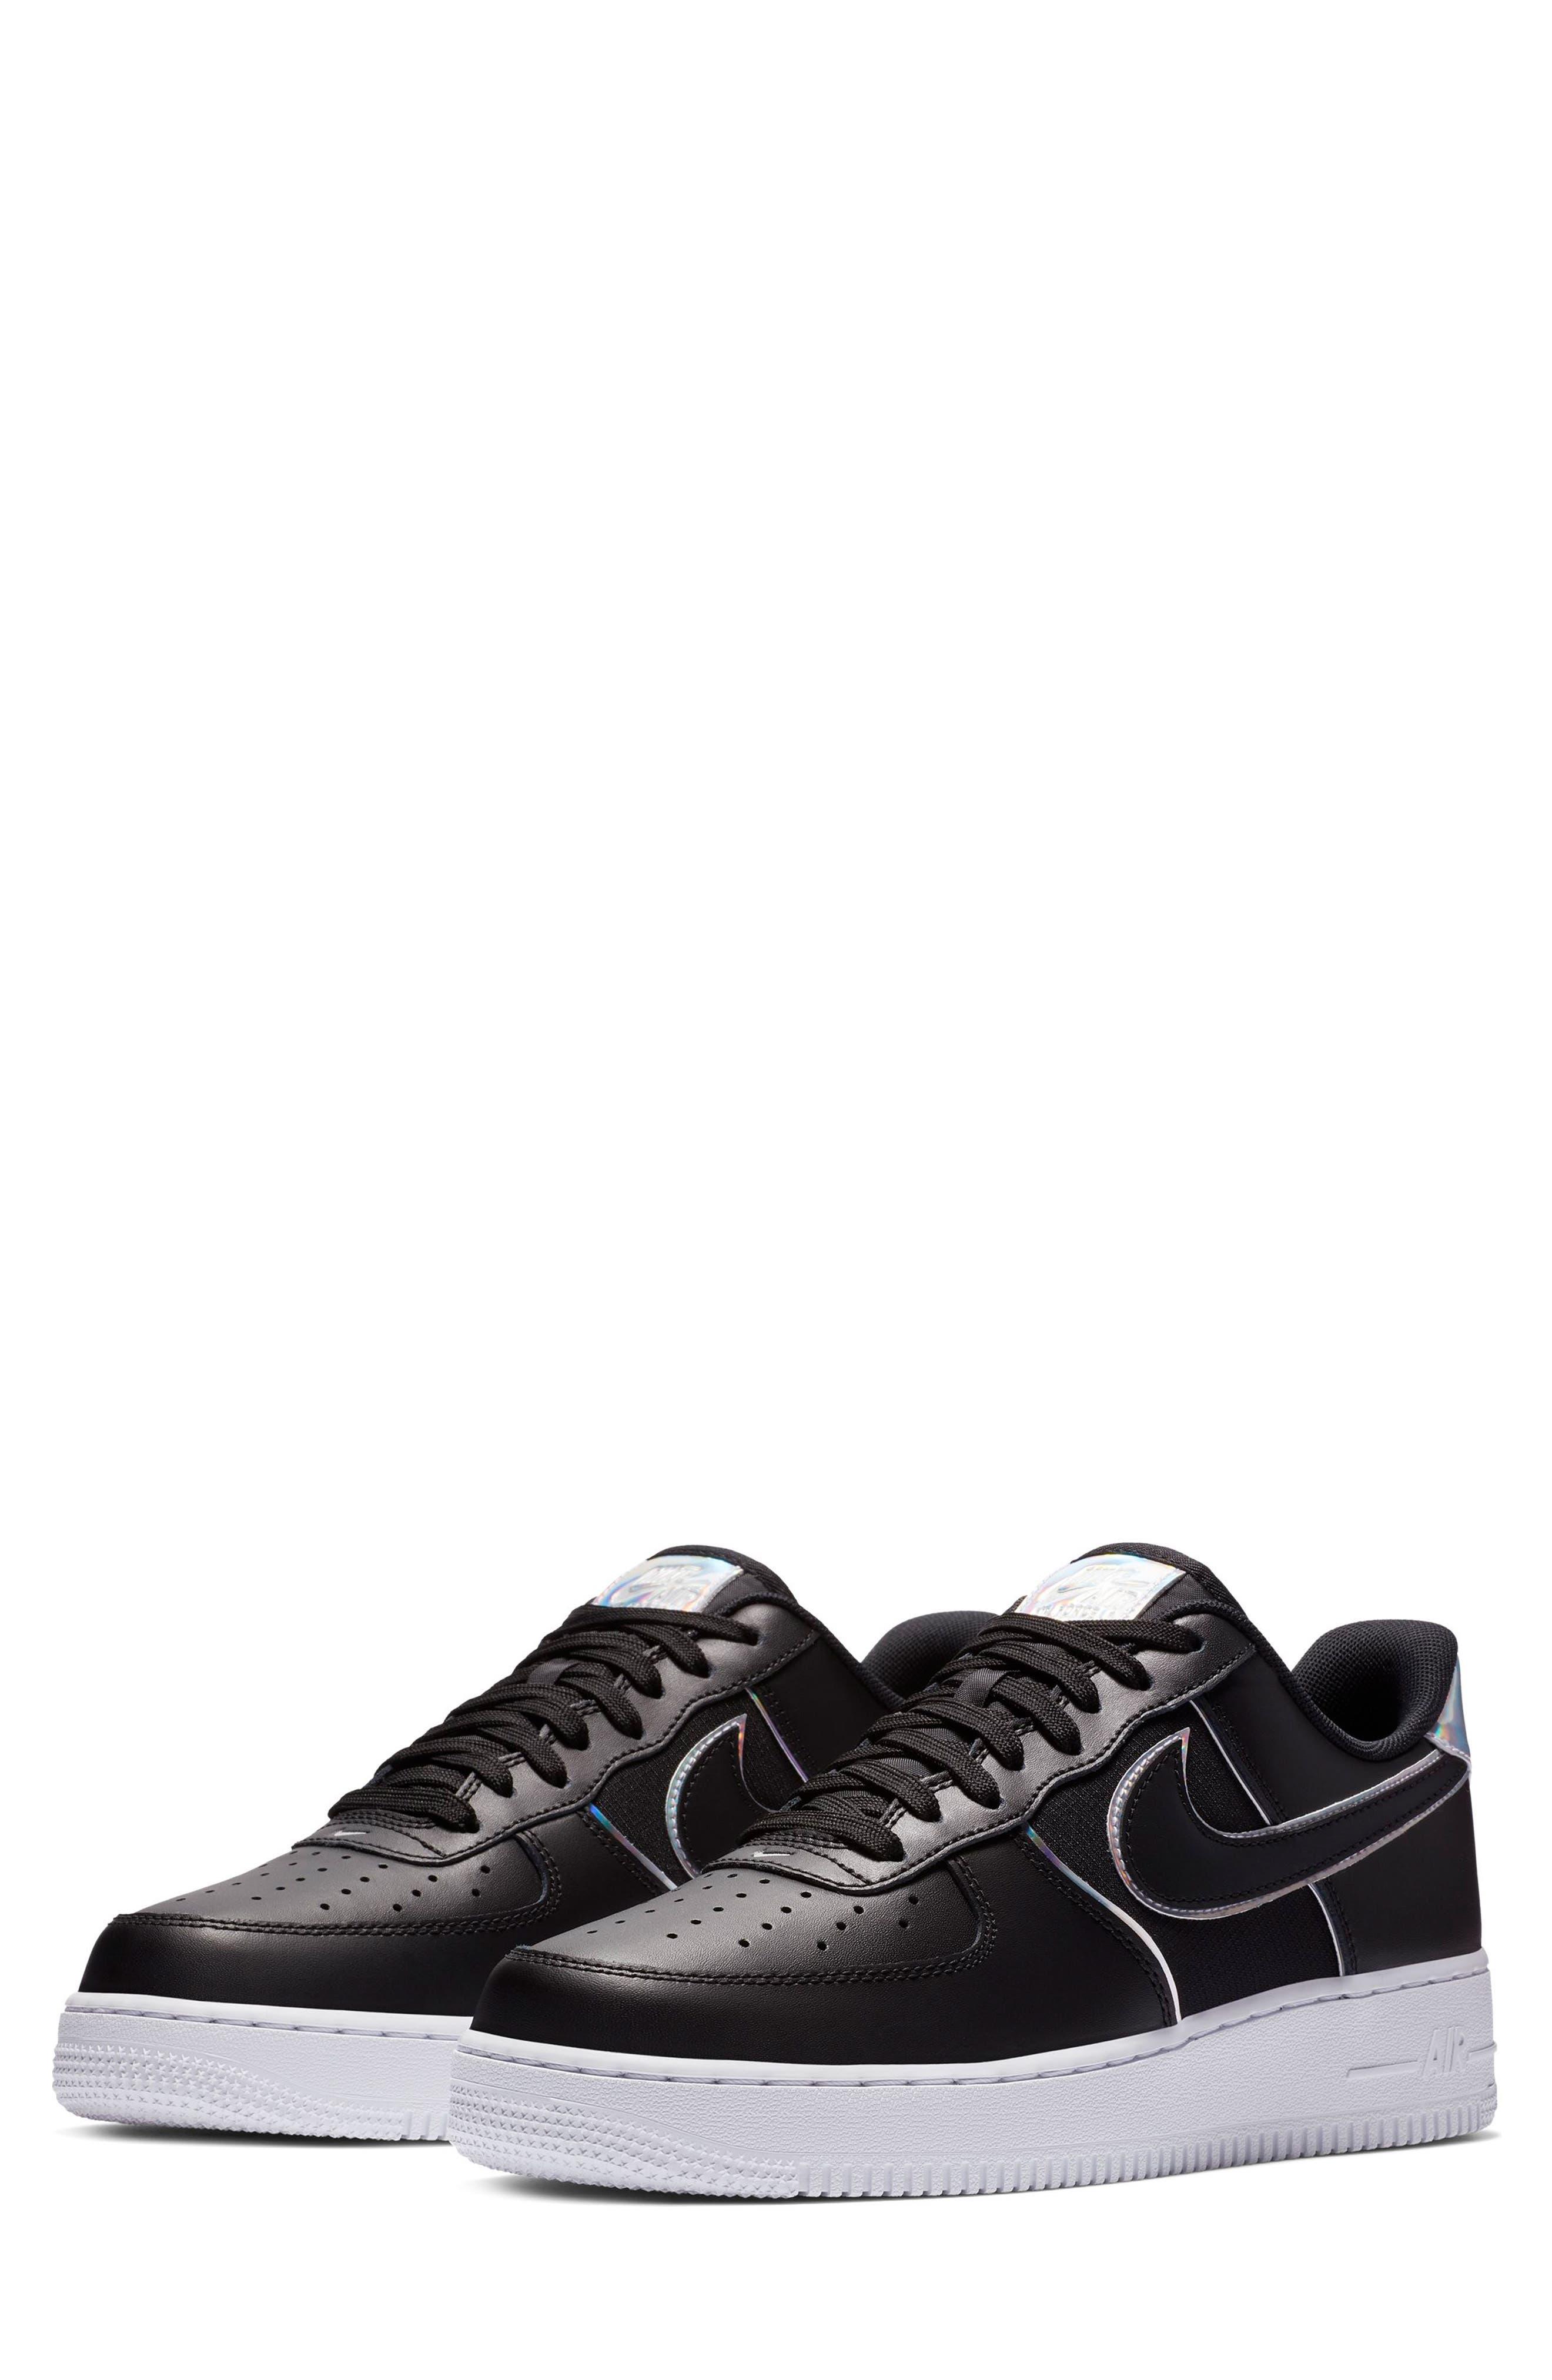 NIKE, Air Force 1 '07 LV8 4 Sneaker, Main thumbnail 1, color, 001